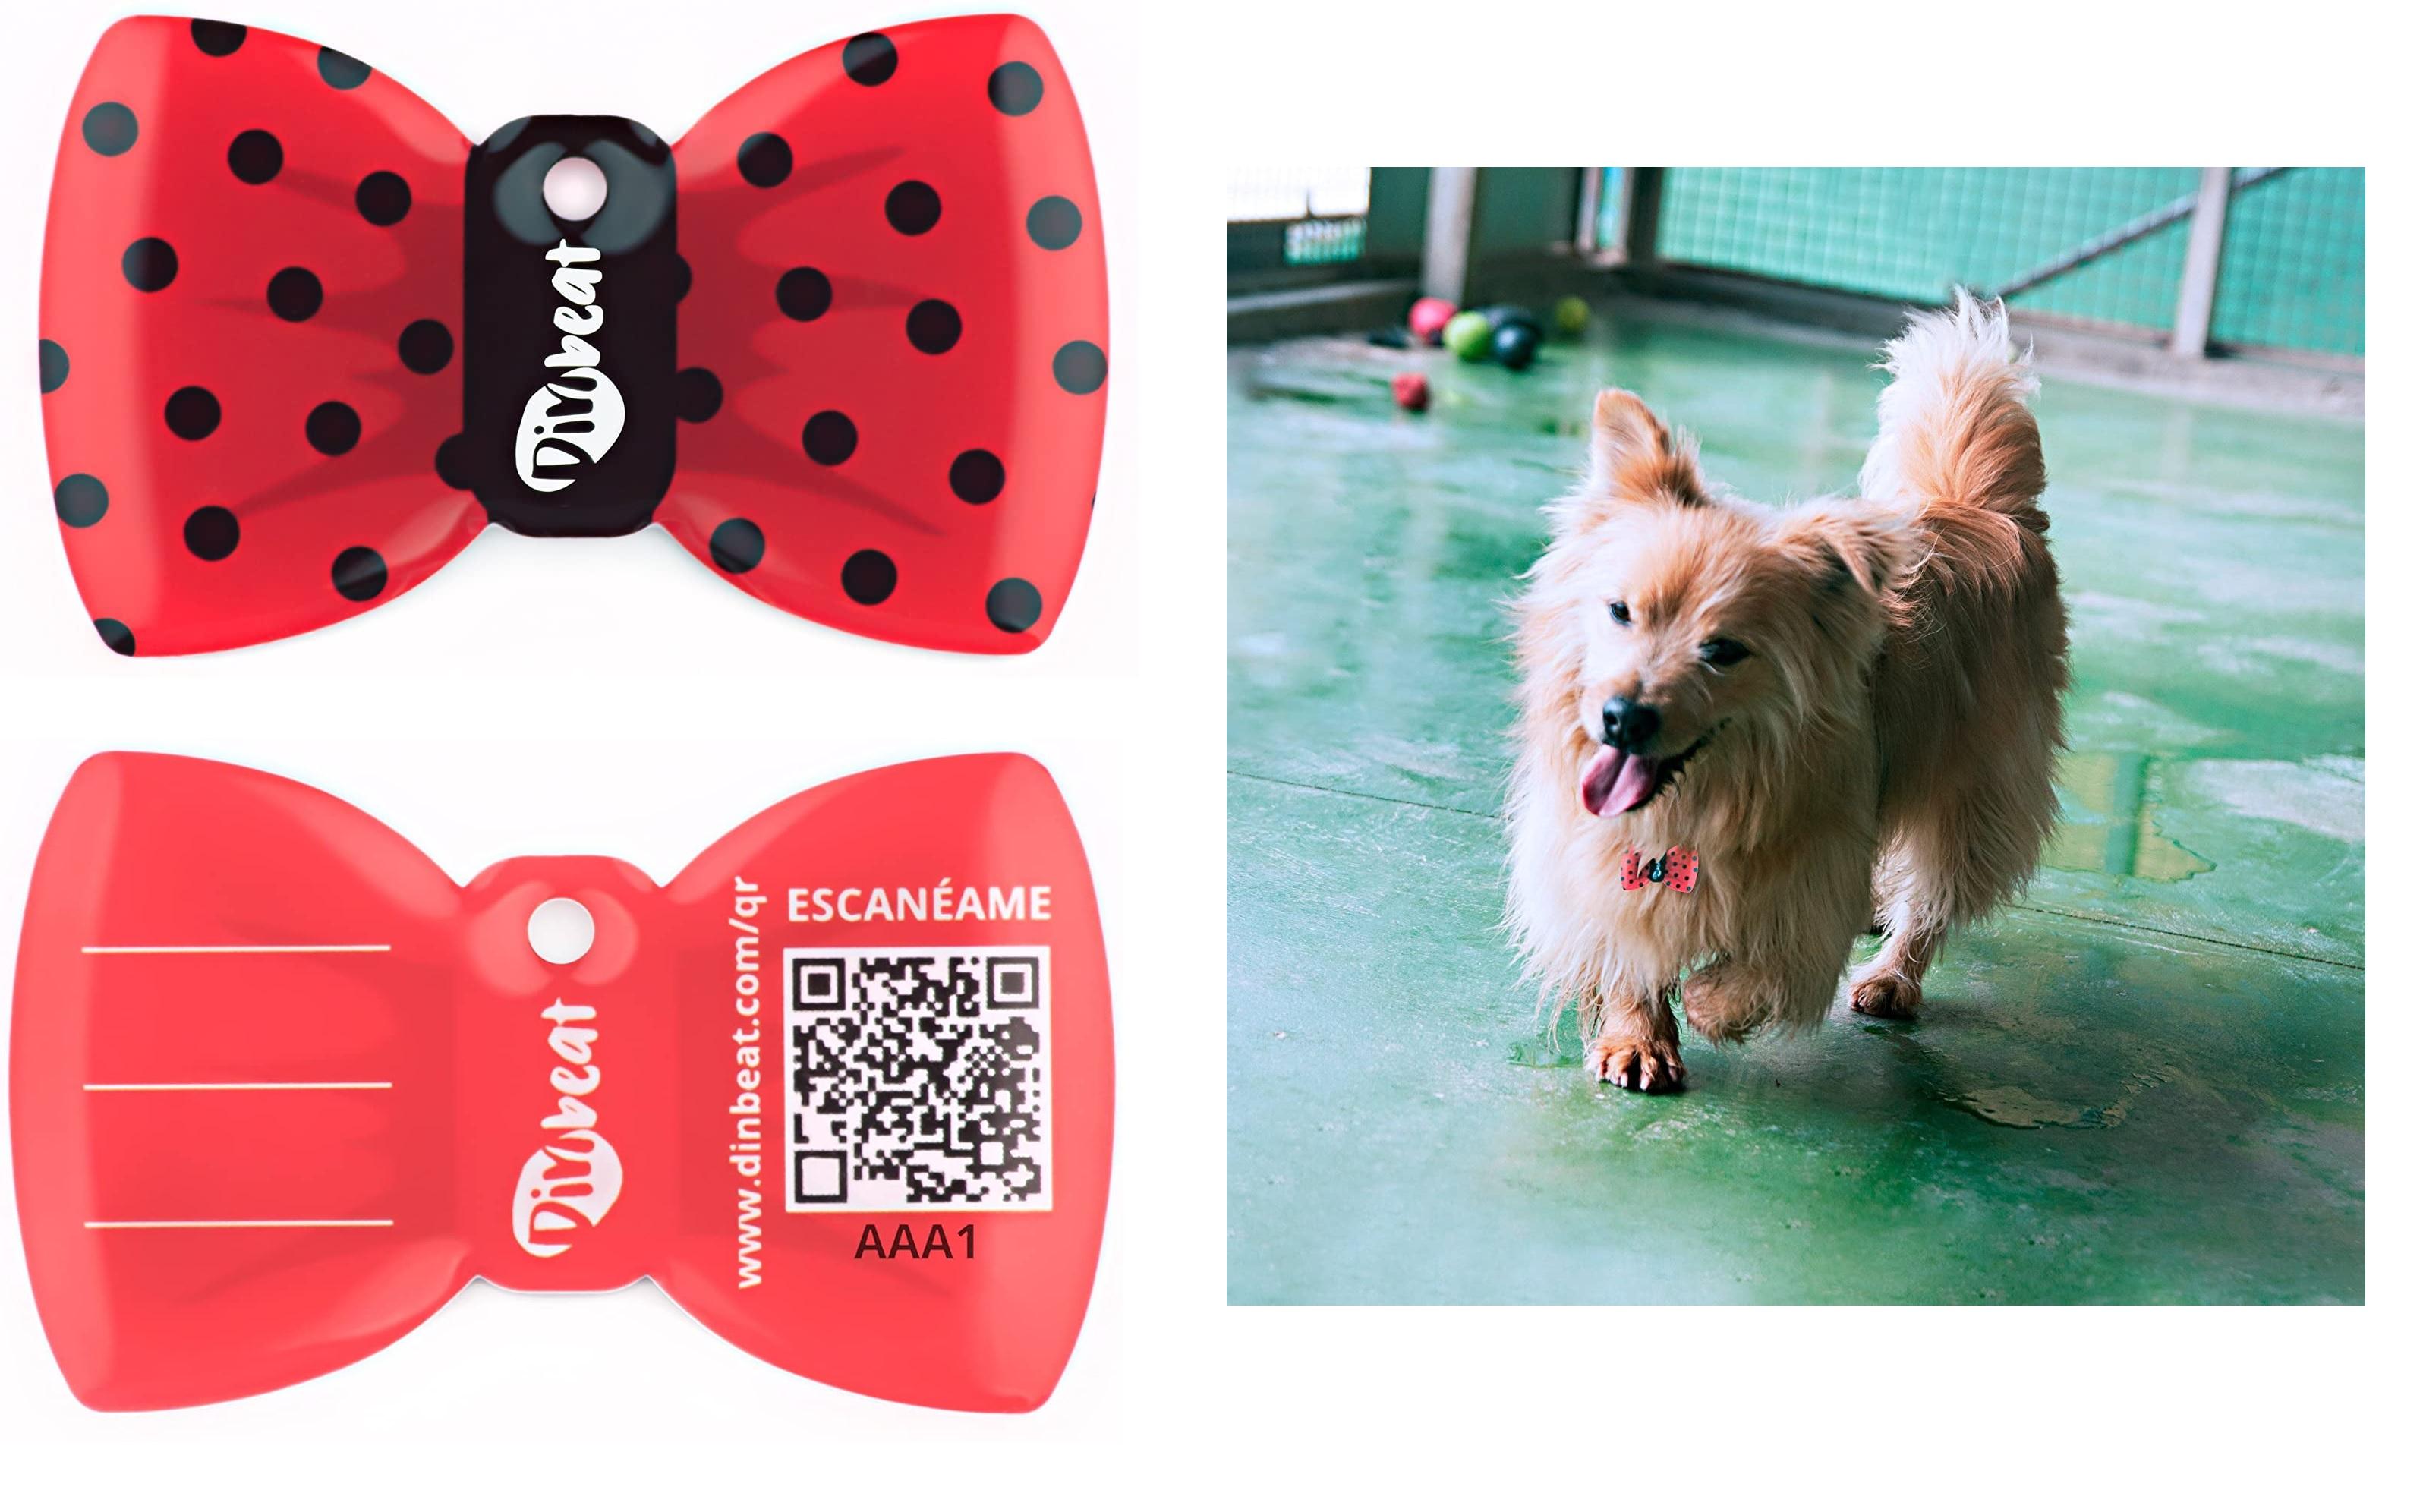 Dinbeat Placa modelo Pajarita Olé - Identificación Mascota QR (TSS)